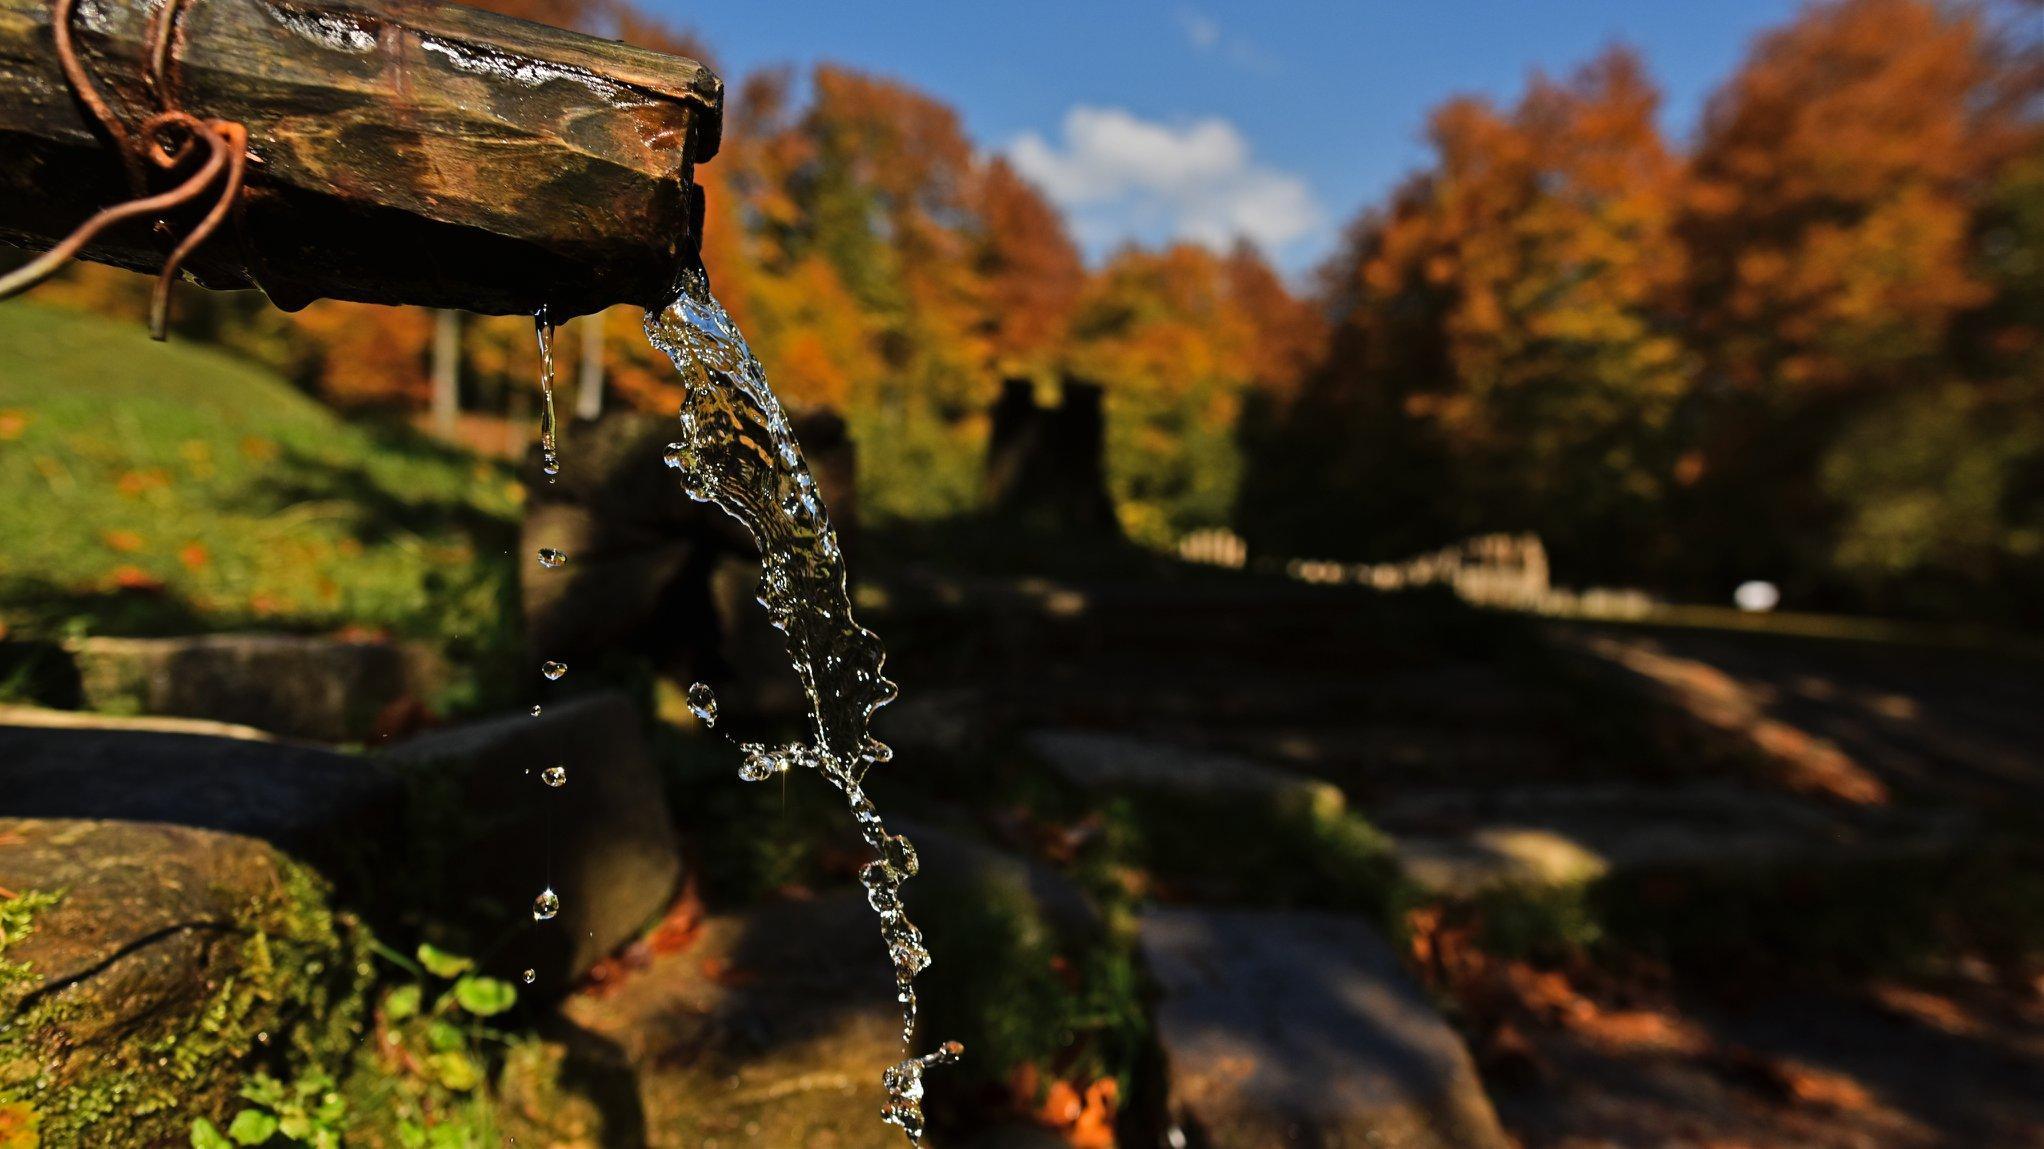 Come and discover the autumn show at Sarmizegetusa Regia